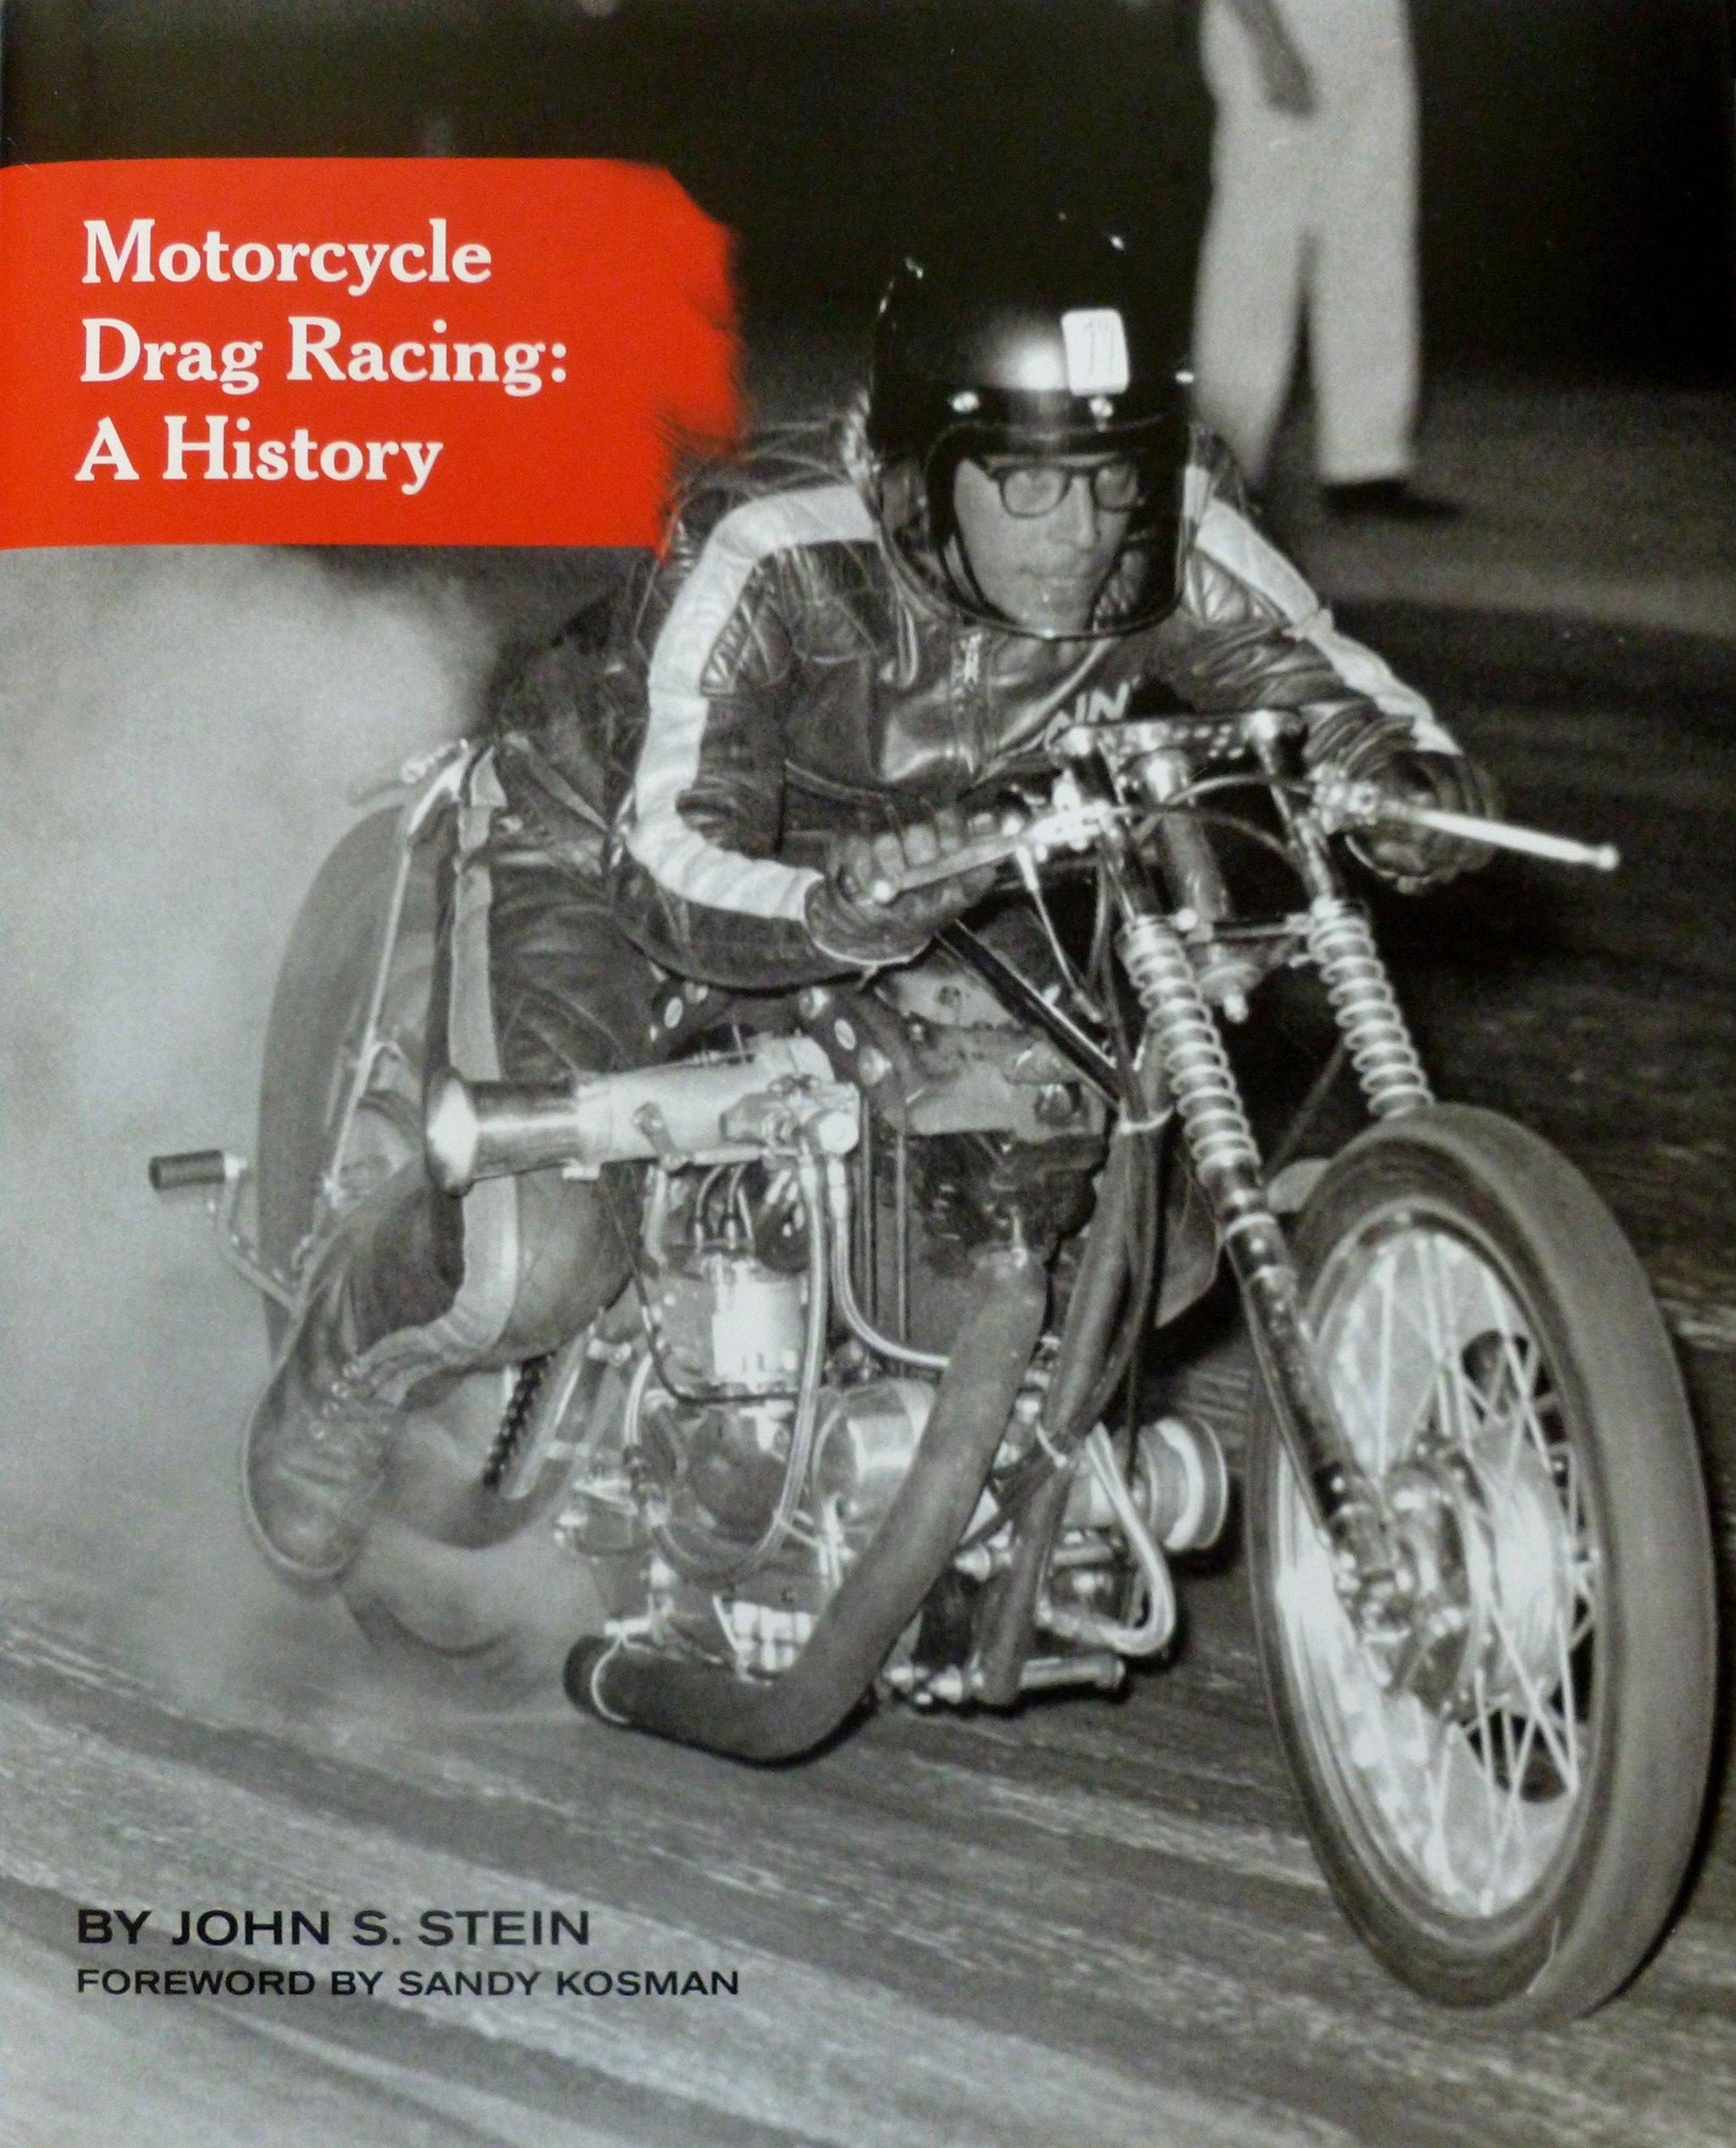 motorcycle history. Motorcycle Drag Racing: A History: John Stein: 9780578091853: Amazon.com: Books History O